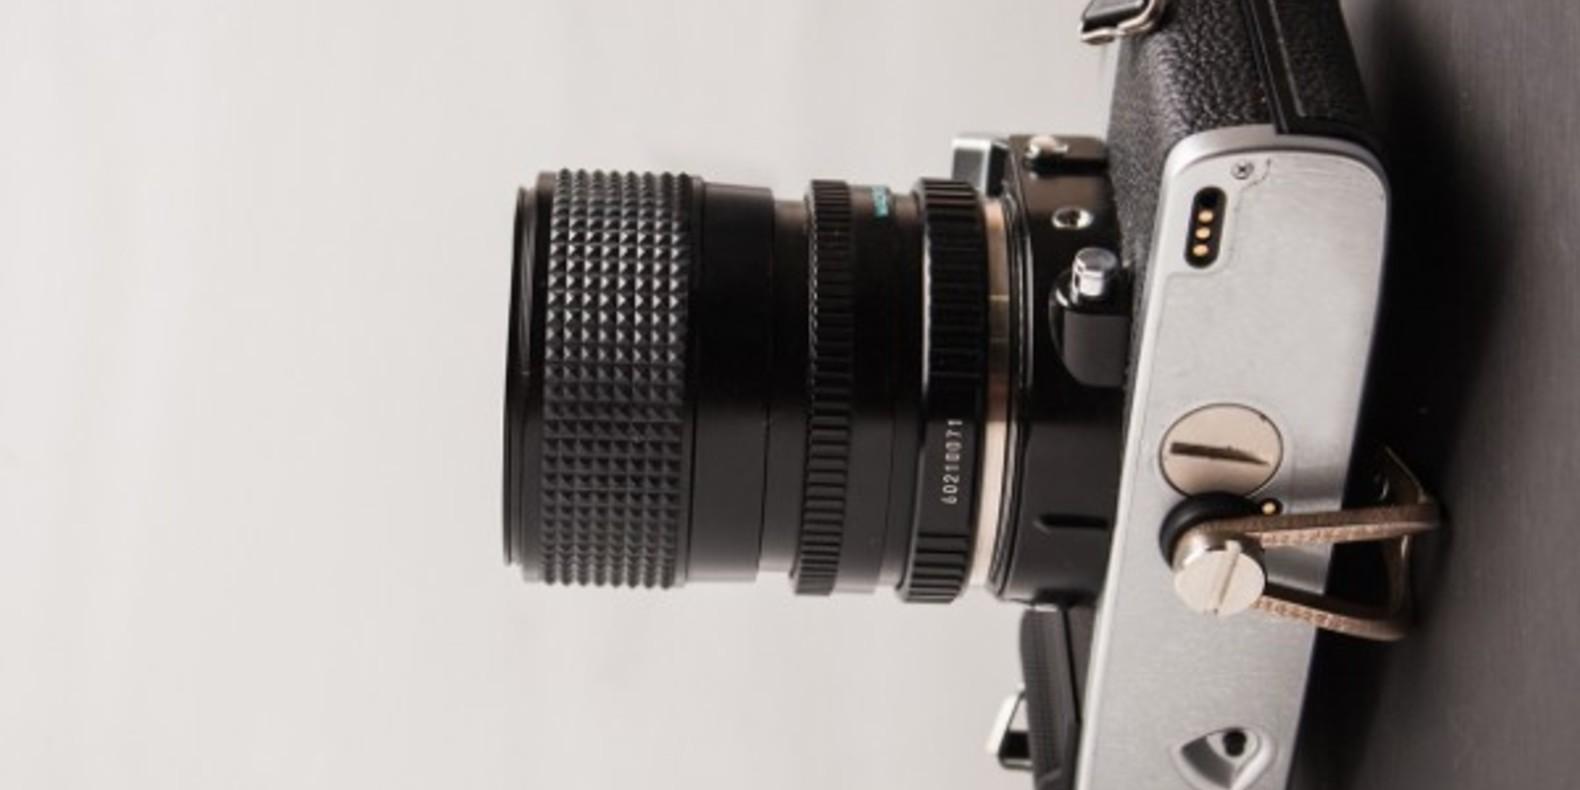 Hangie laudlab fichier 3D cults appareil photo camera 5